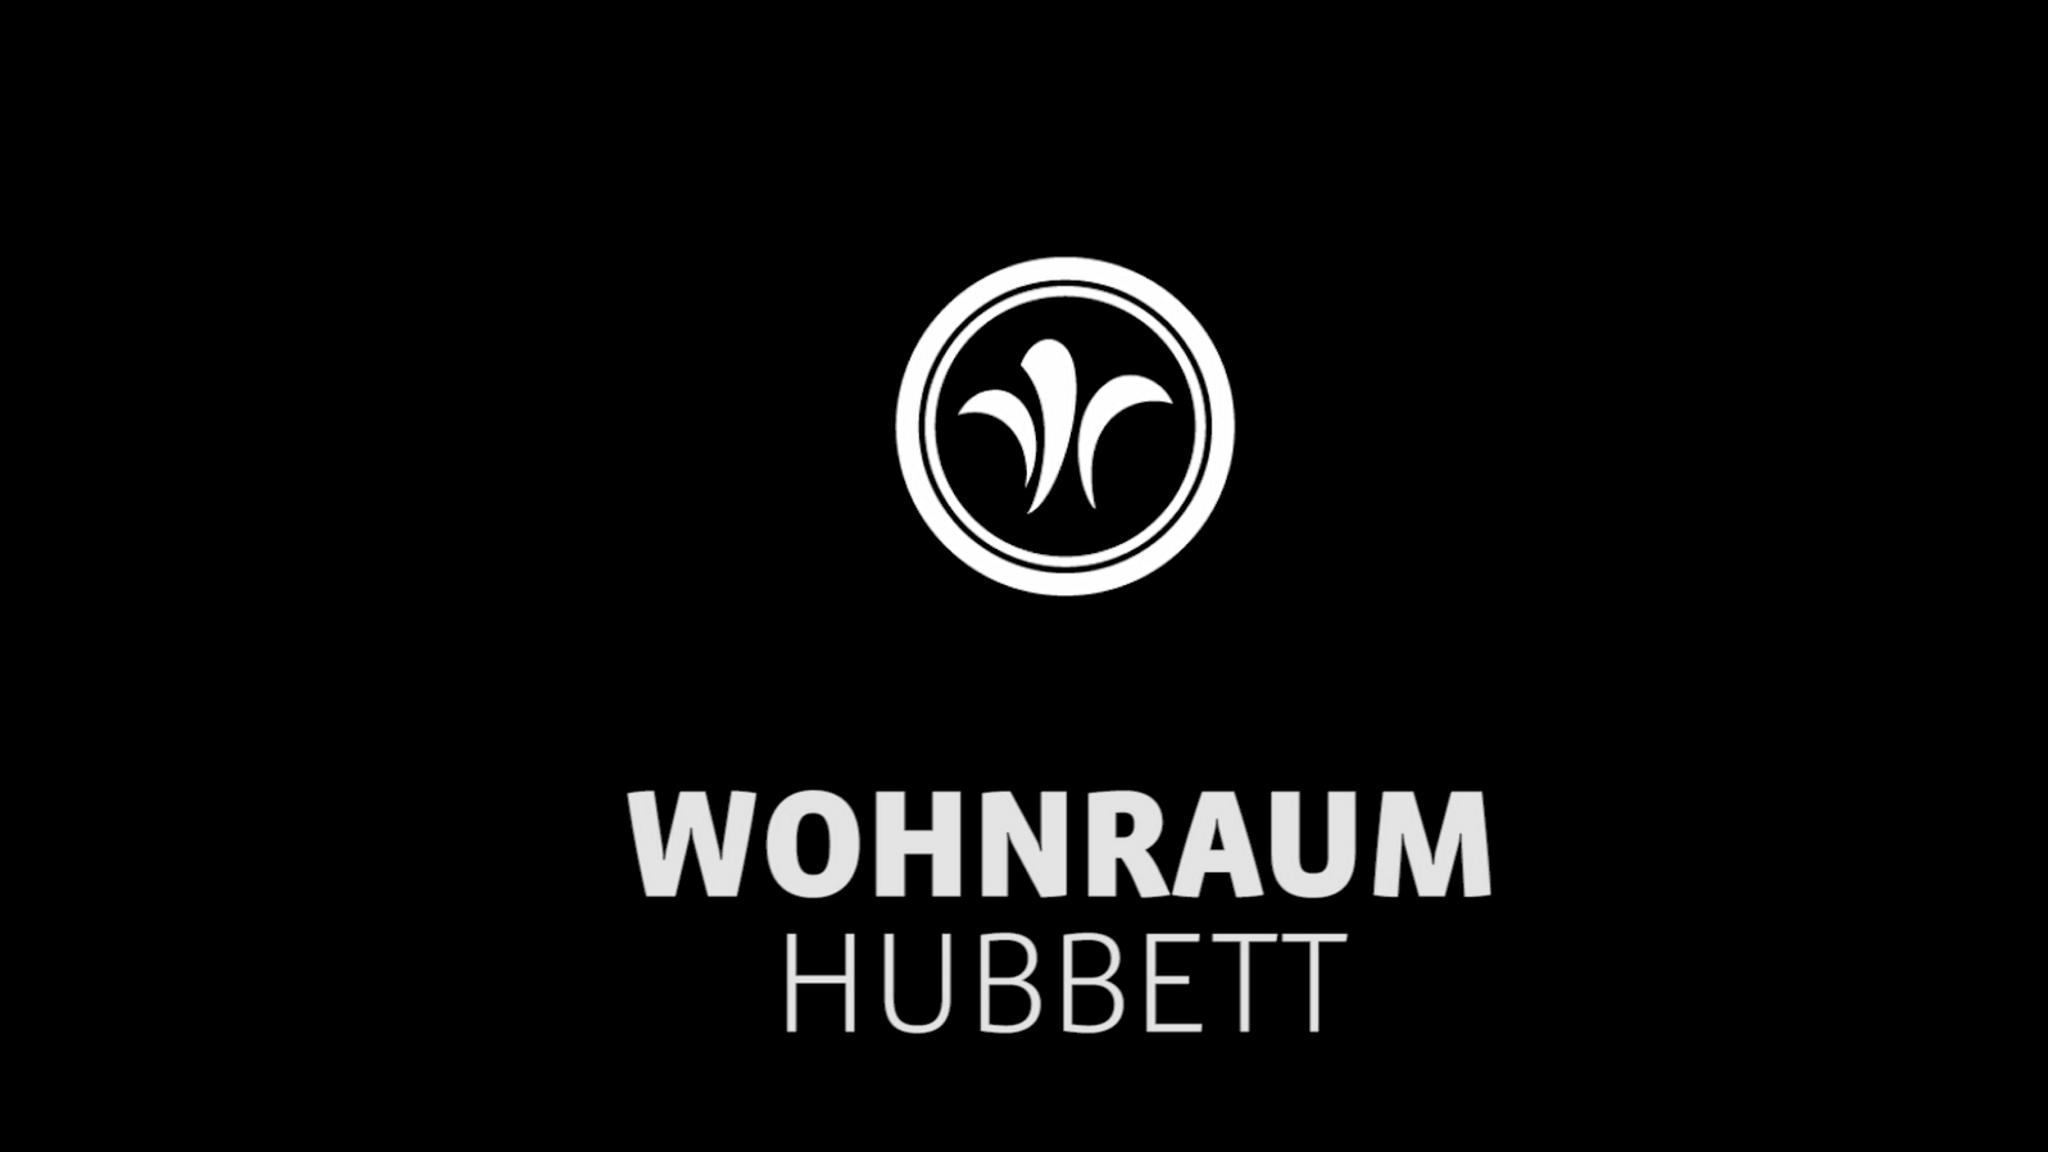 Wohnmobil Hubbett // Niesmann+Bischoff – Reisemobil (Modell ARTO) // 2019 // WO9